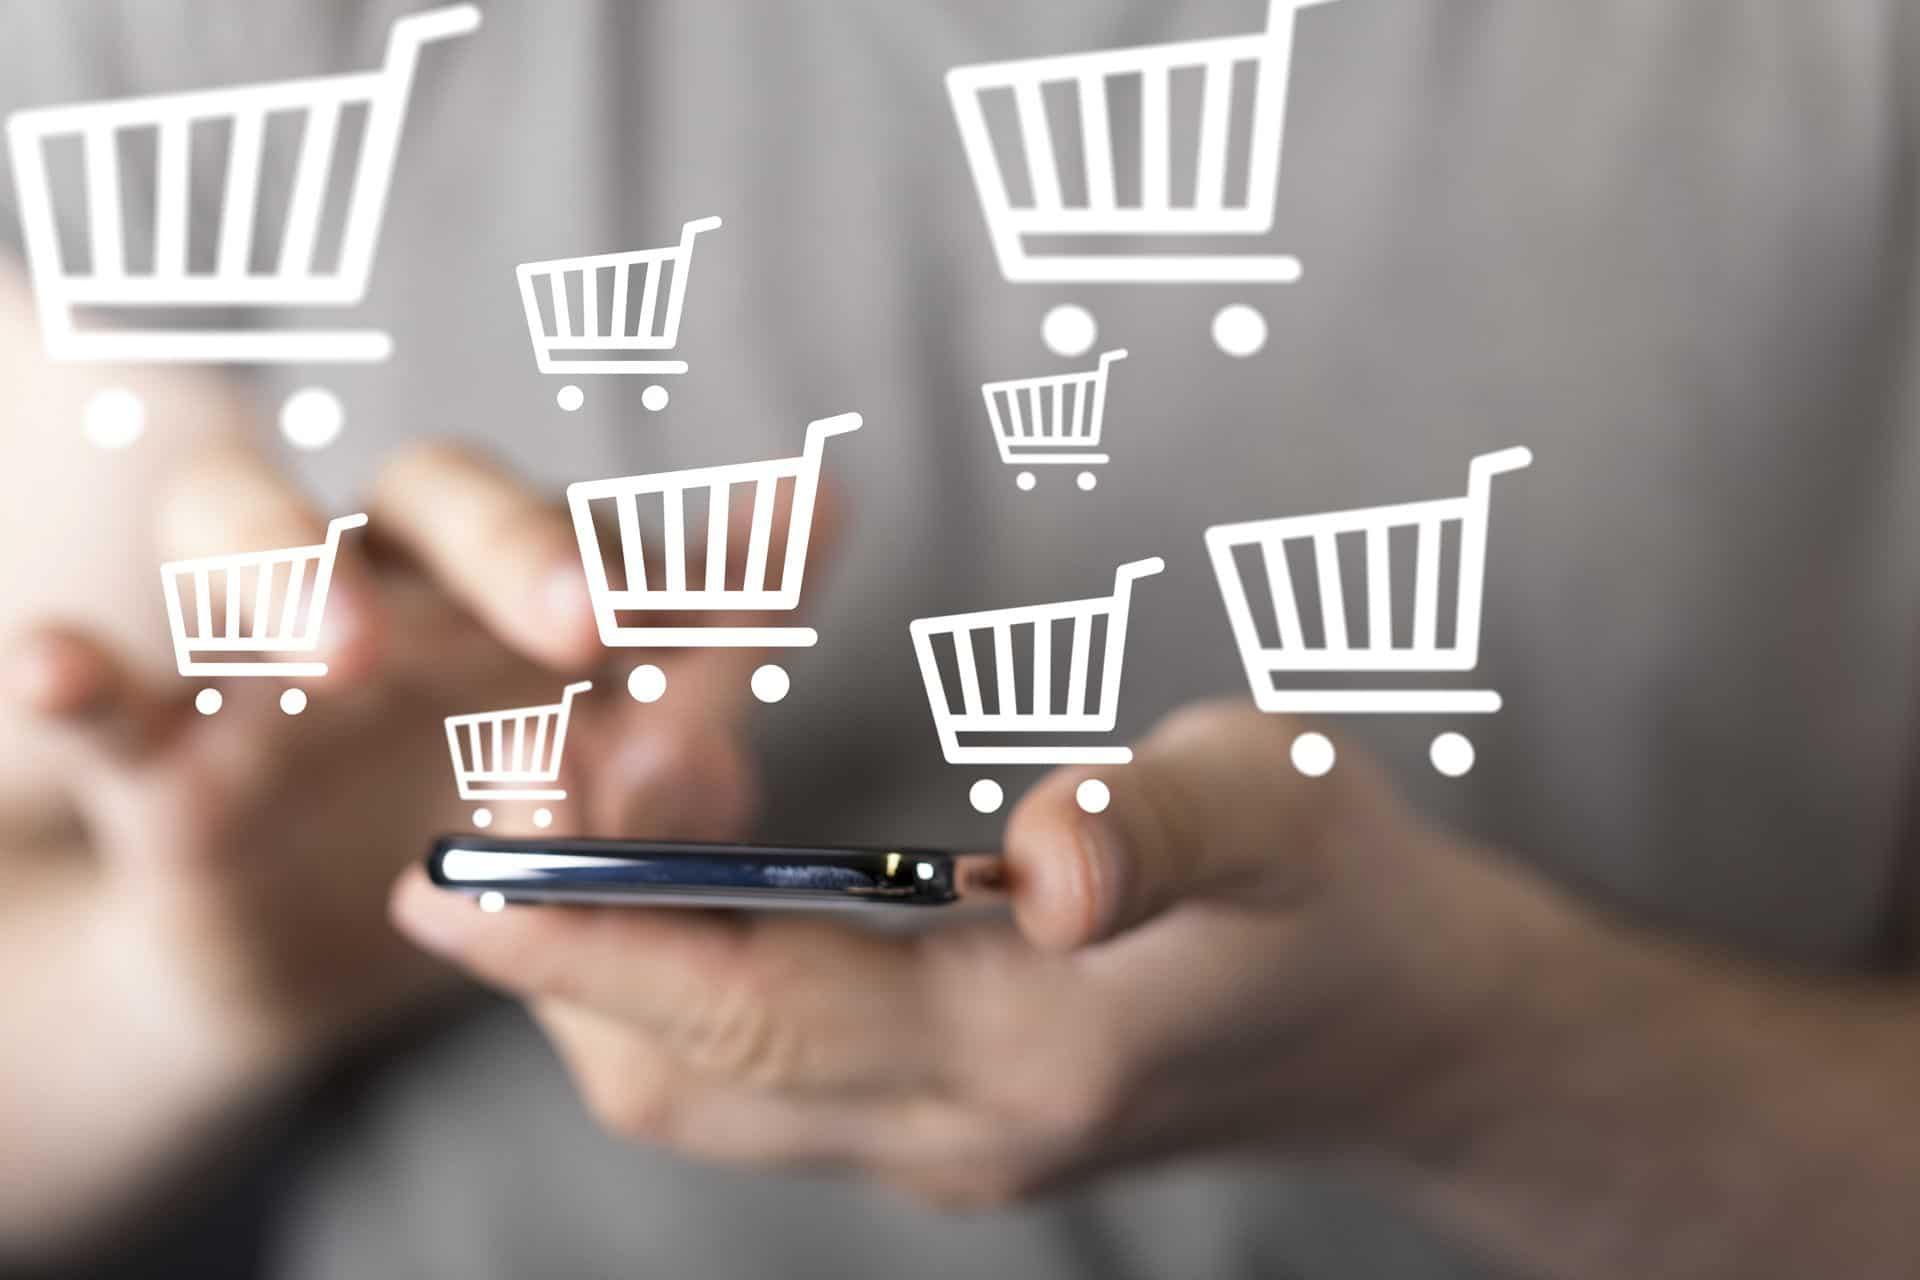 Desarrollo de tiendas online en Cornellà de Llobregat con Prestashop o Woocommerce